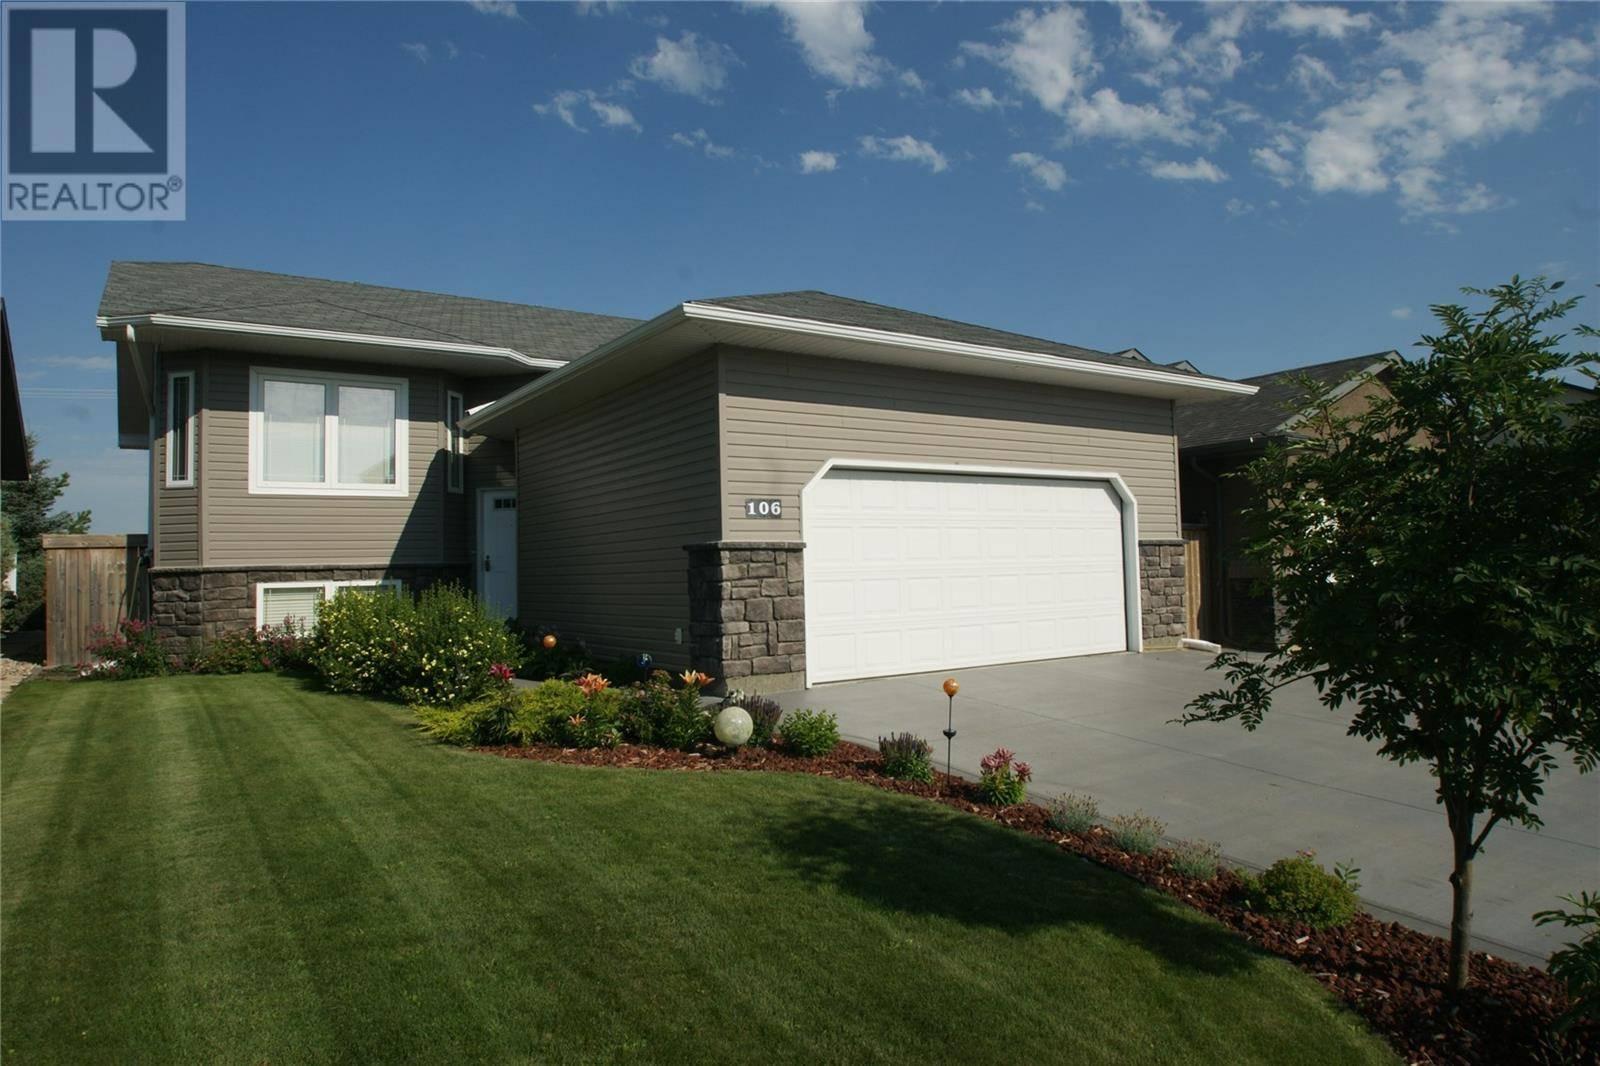 House for sale at 106 Lamarsh Rd Saskatoon Saskatchewan - MLS: SK784255